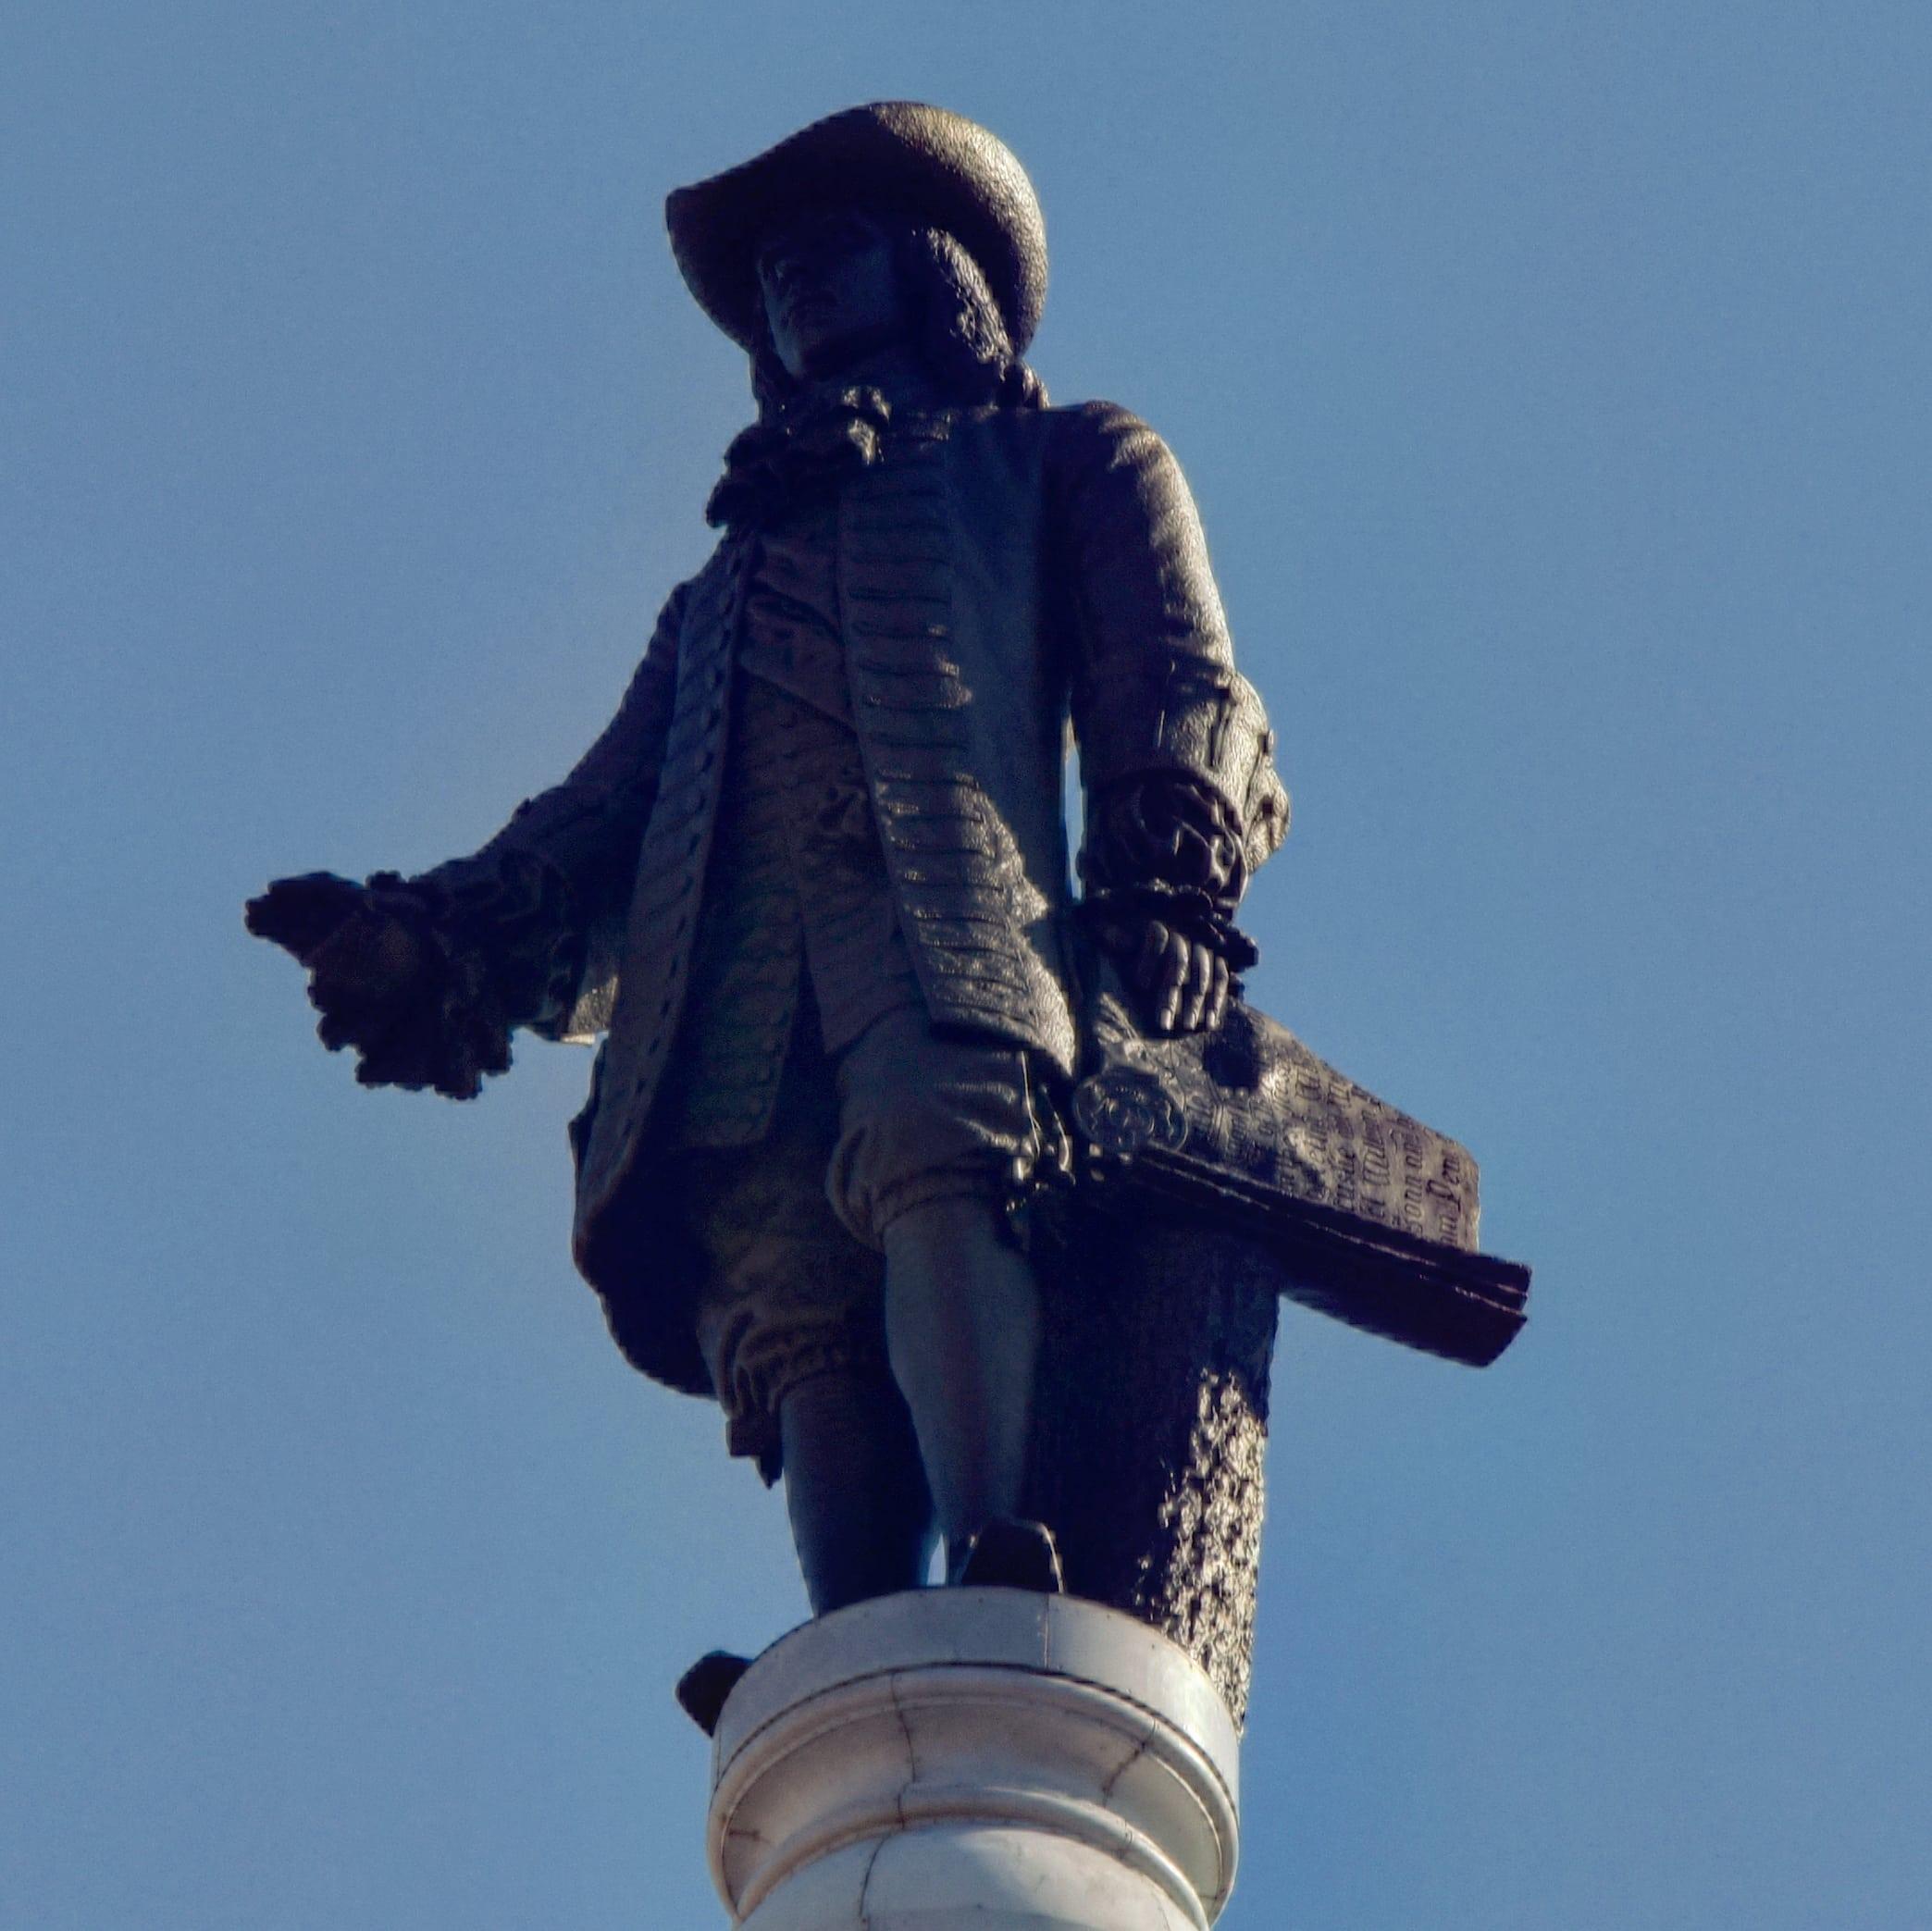 The William Penn statue atop City Hall. Photo by Thomas Koloski